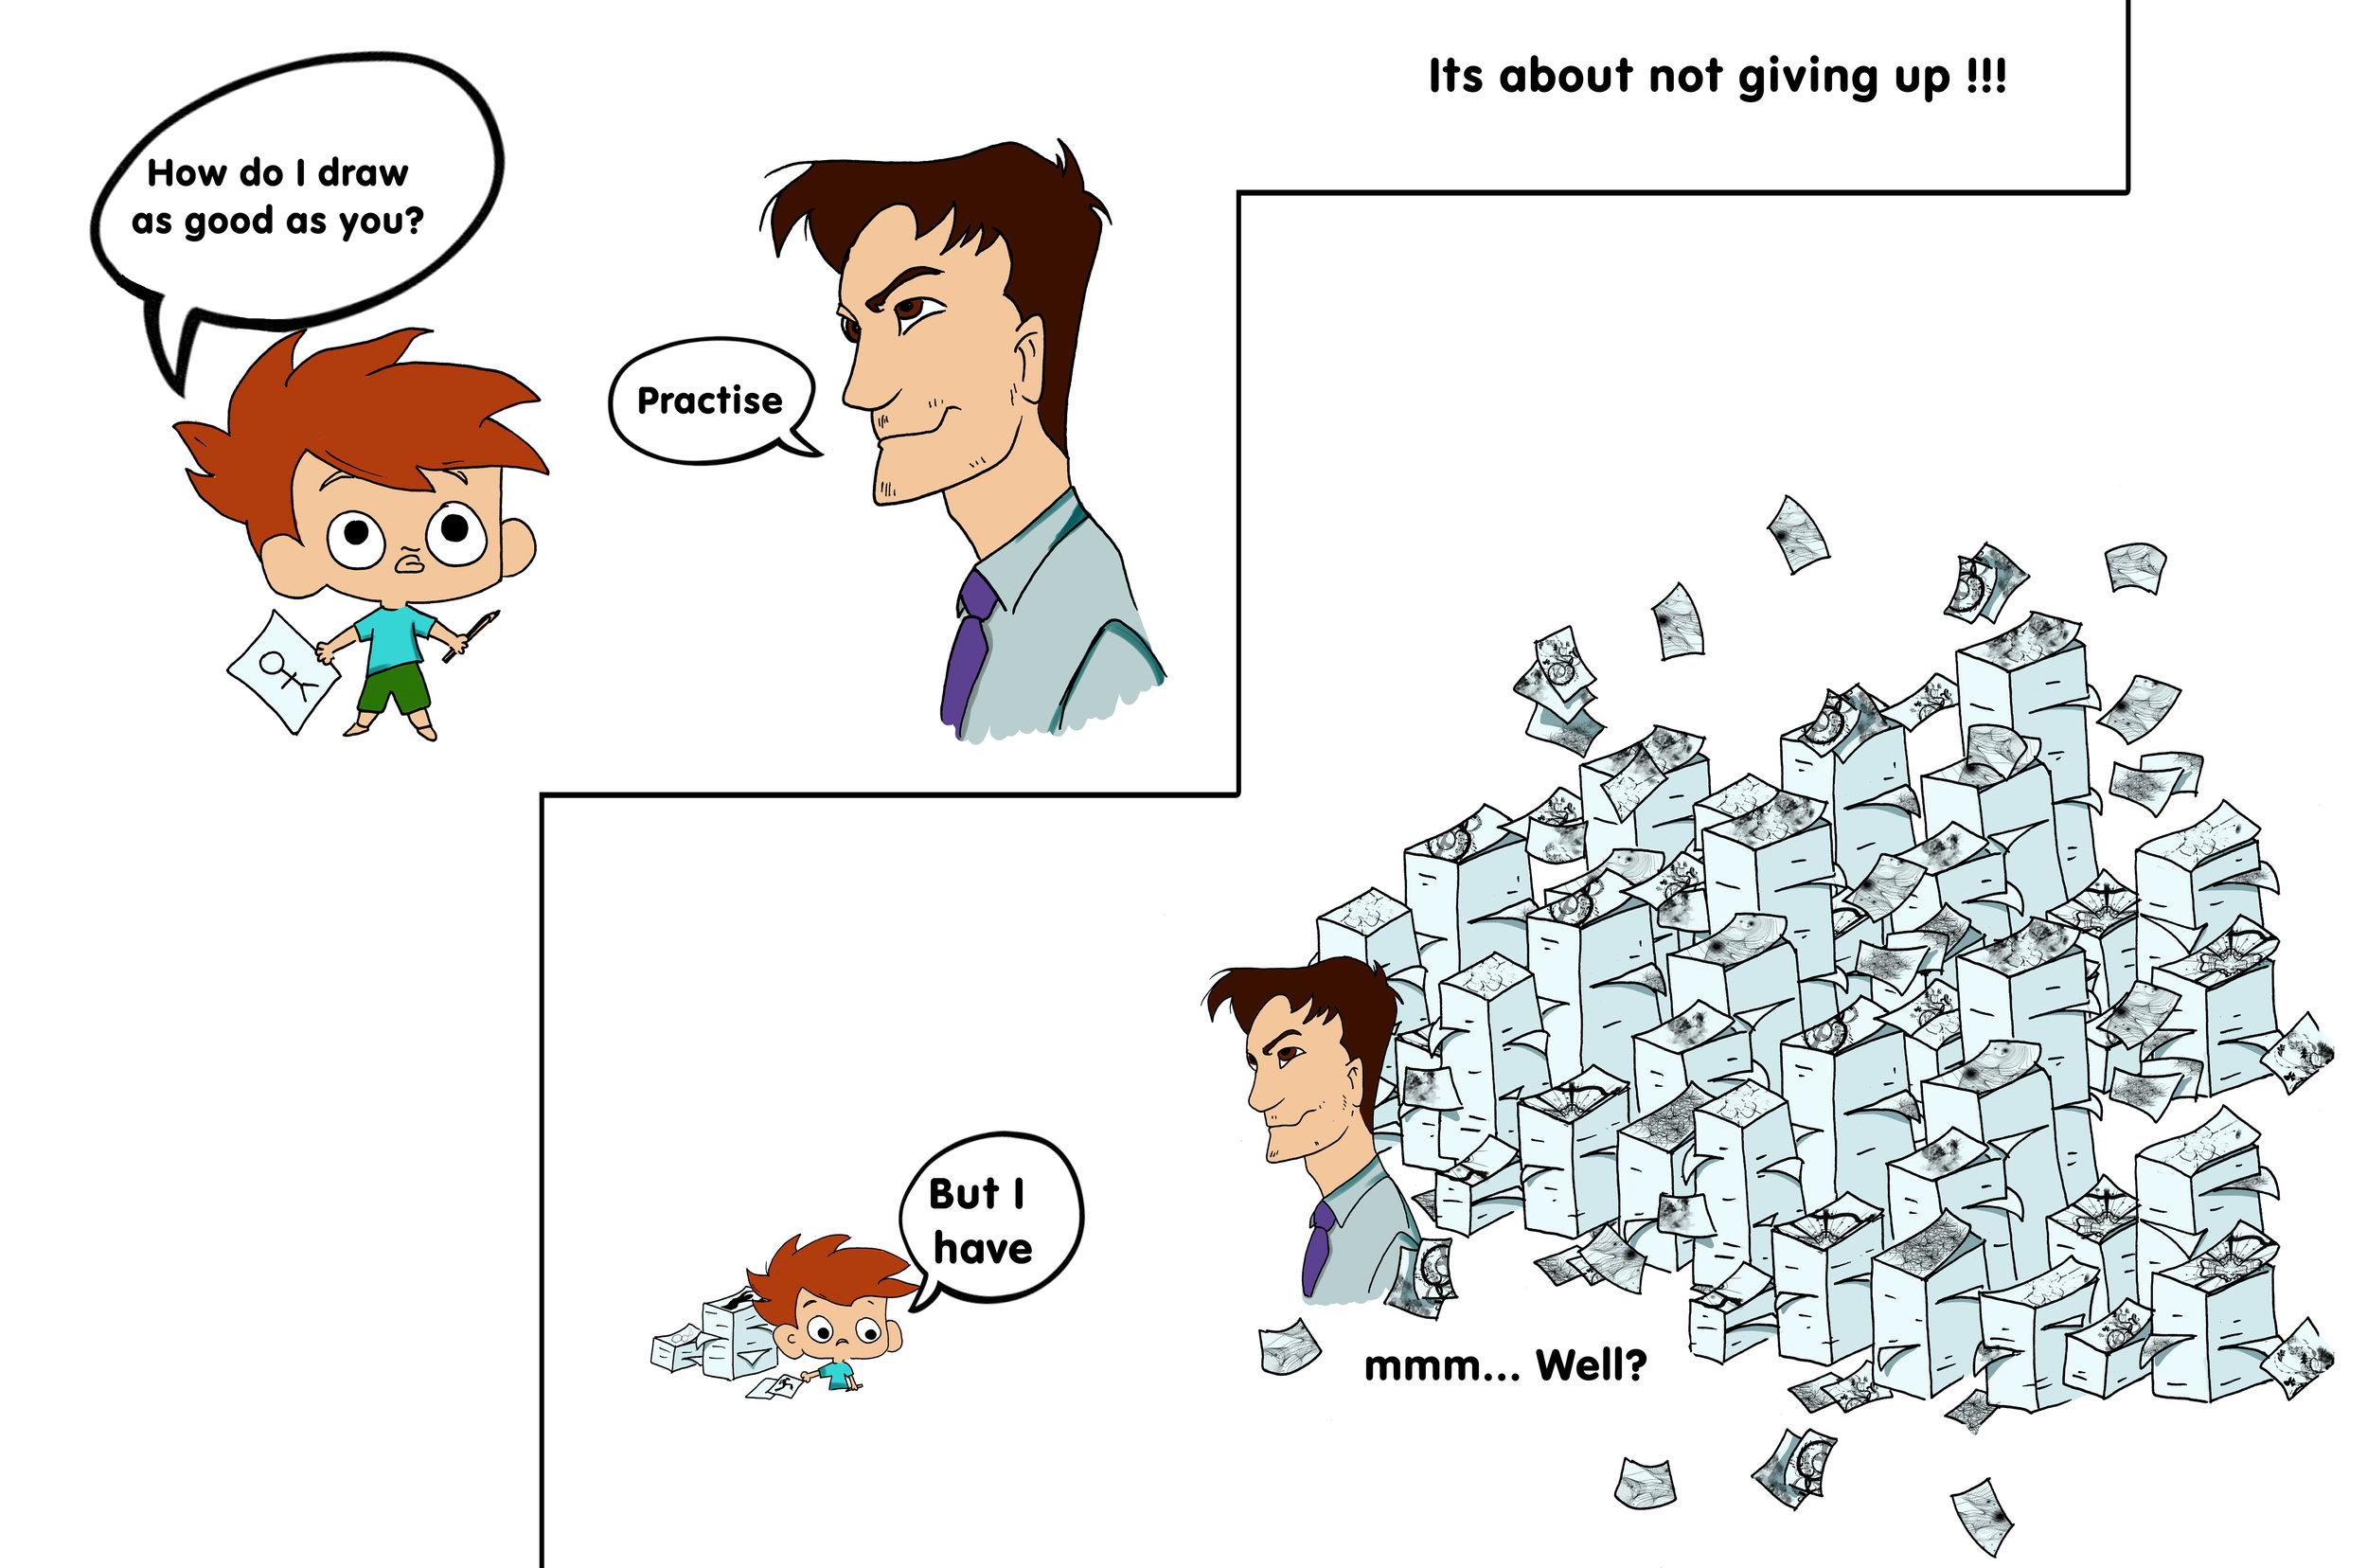 Practise comic.jpg